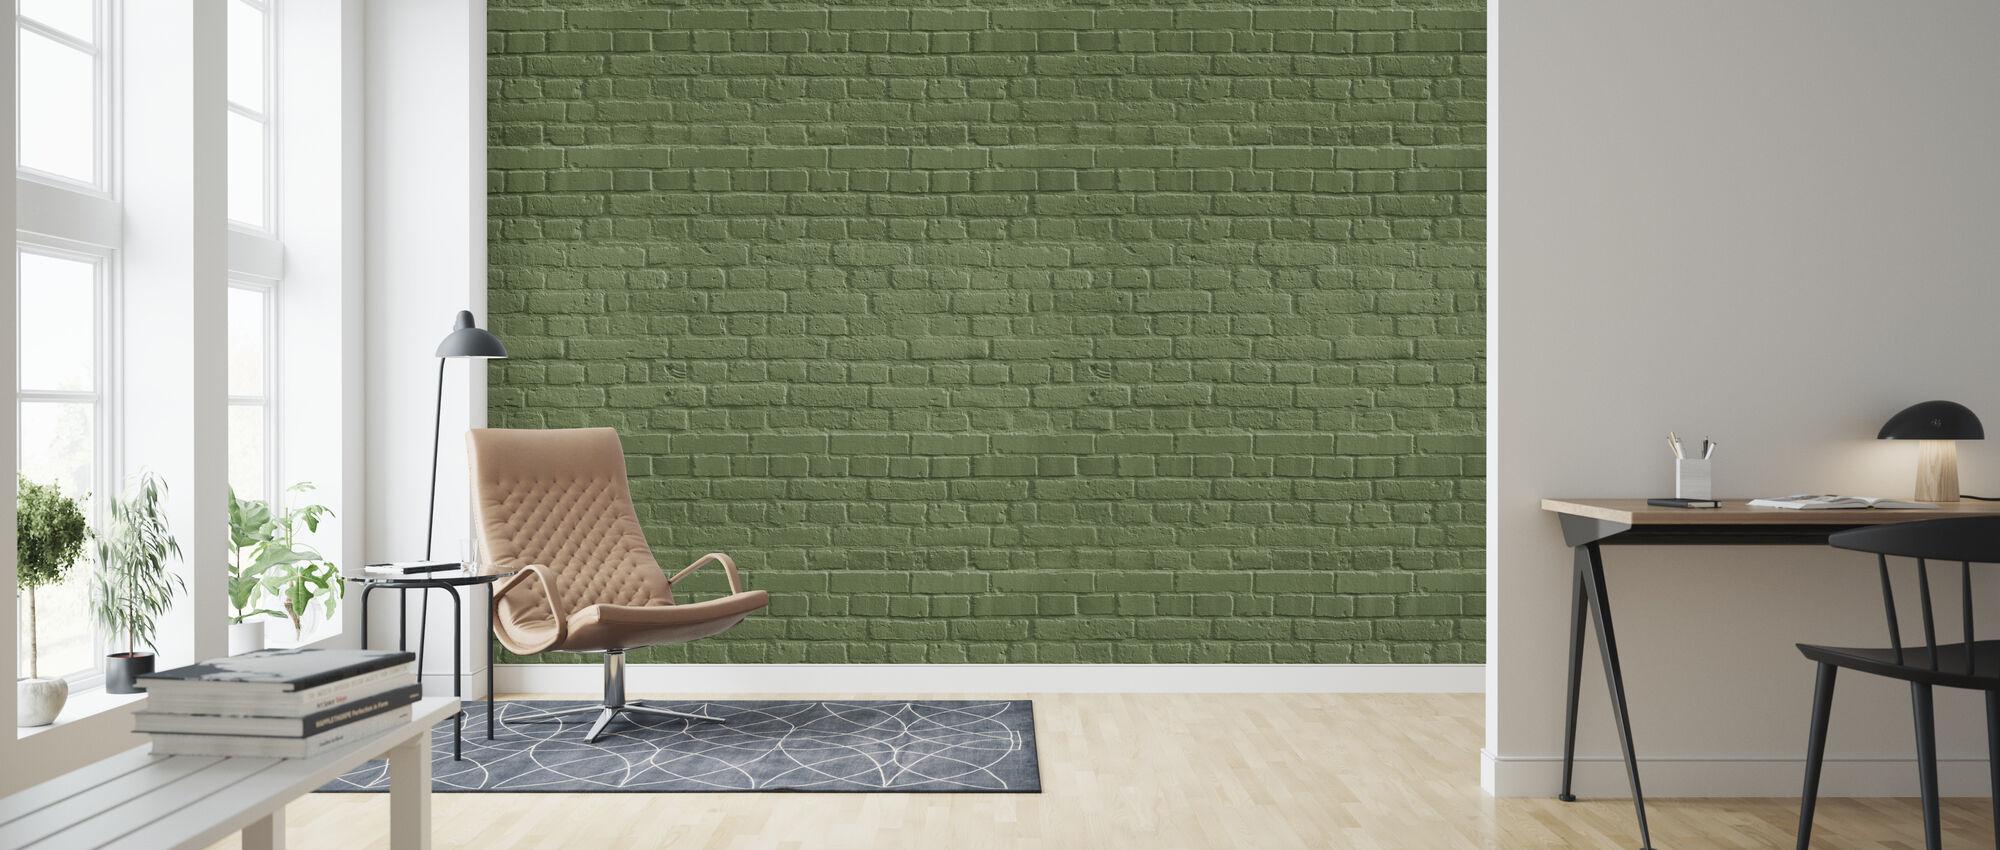 Green Colored Brick Wall - Wallpaper - Living Room